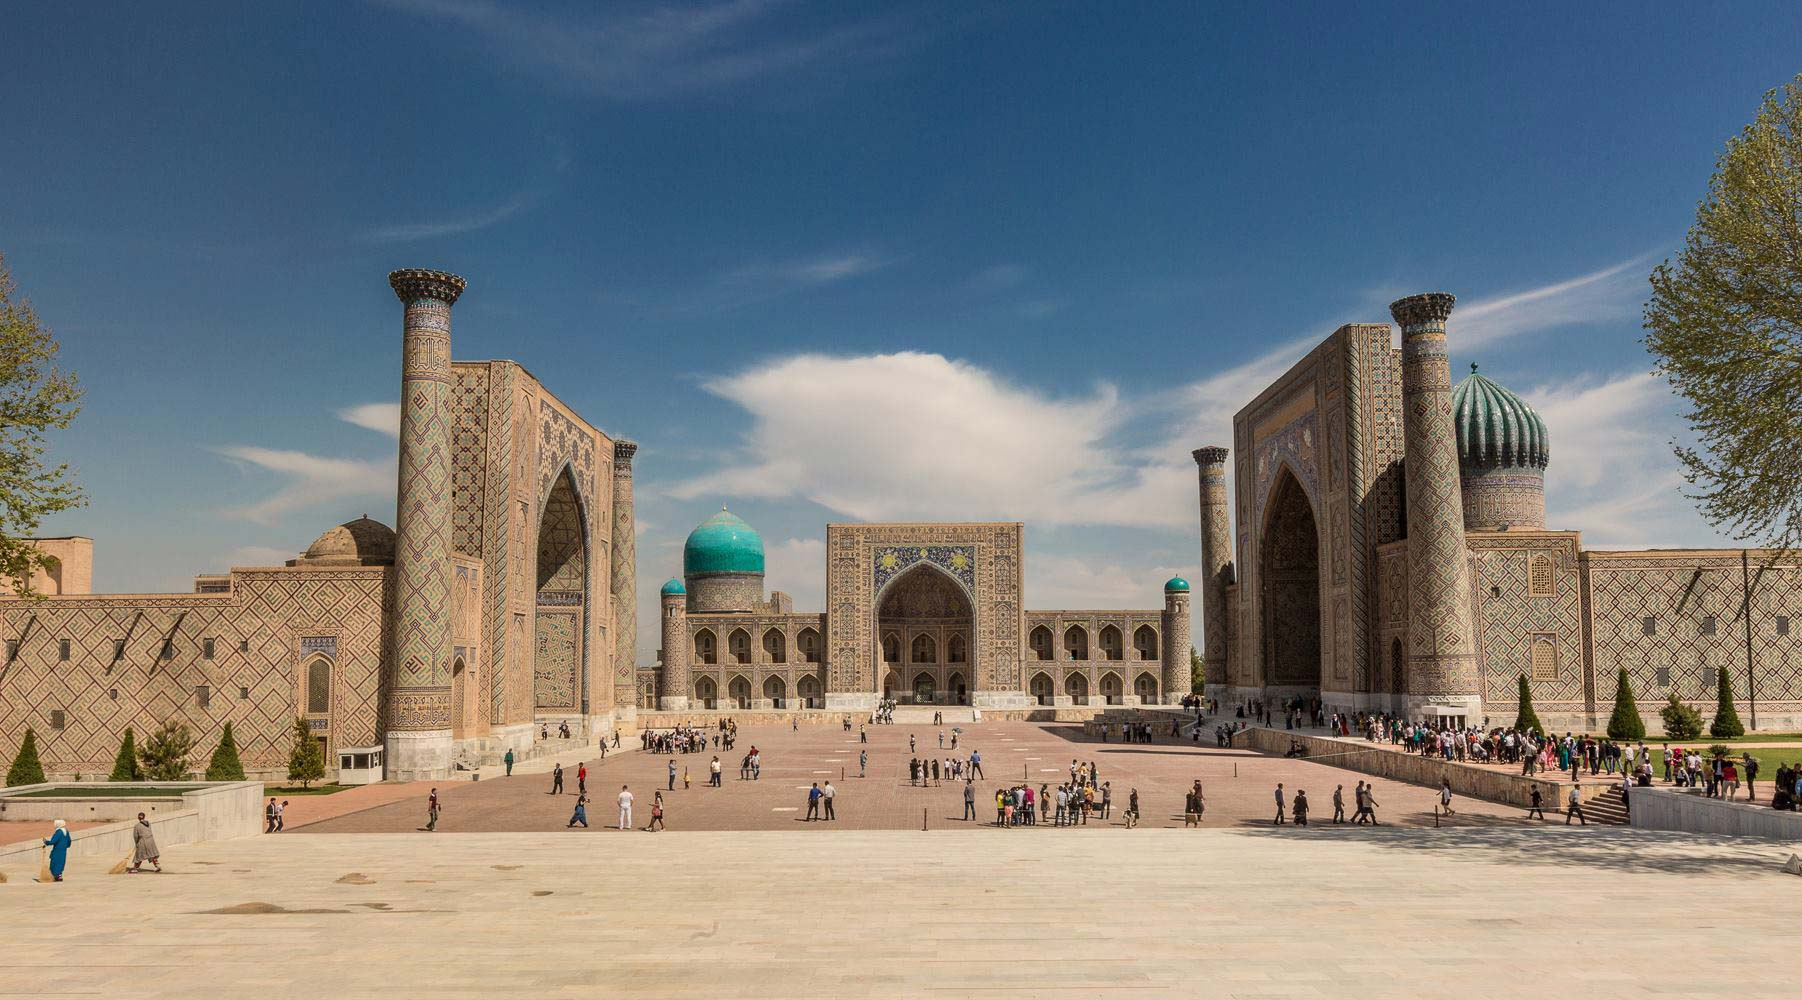 картинки узбекистан хорошие